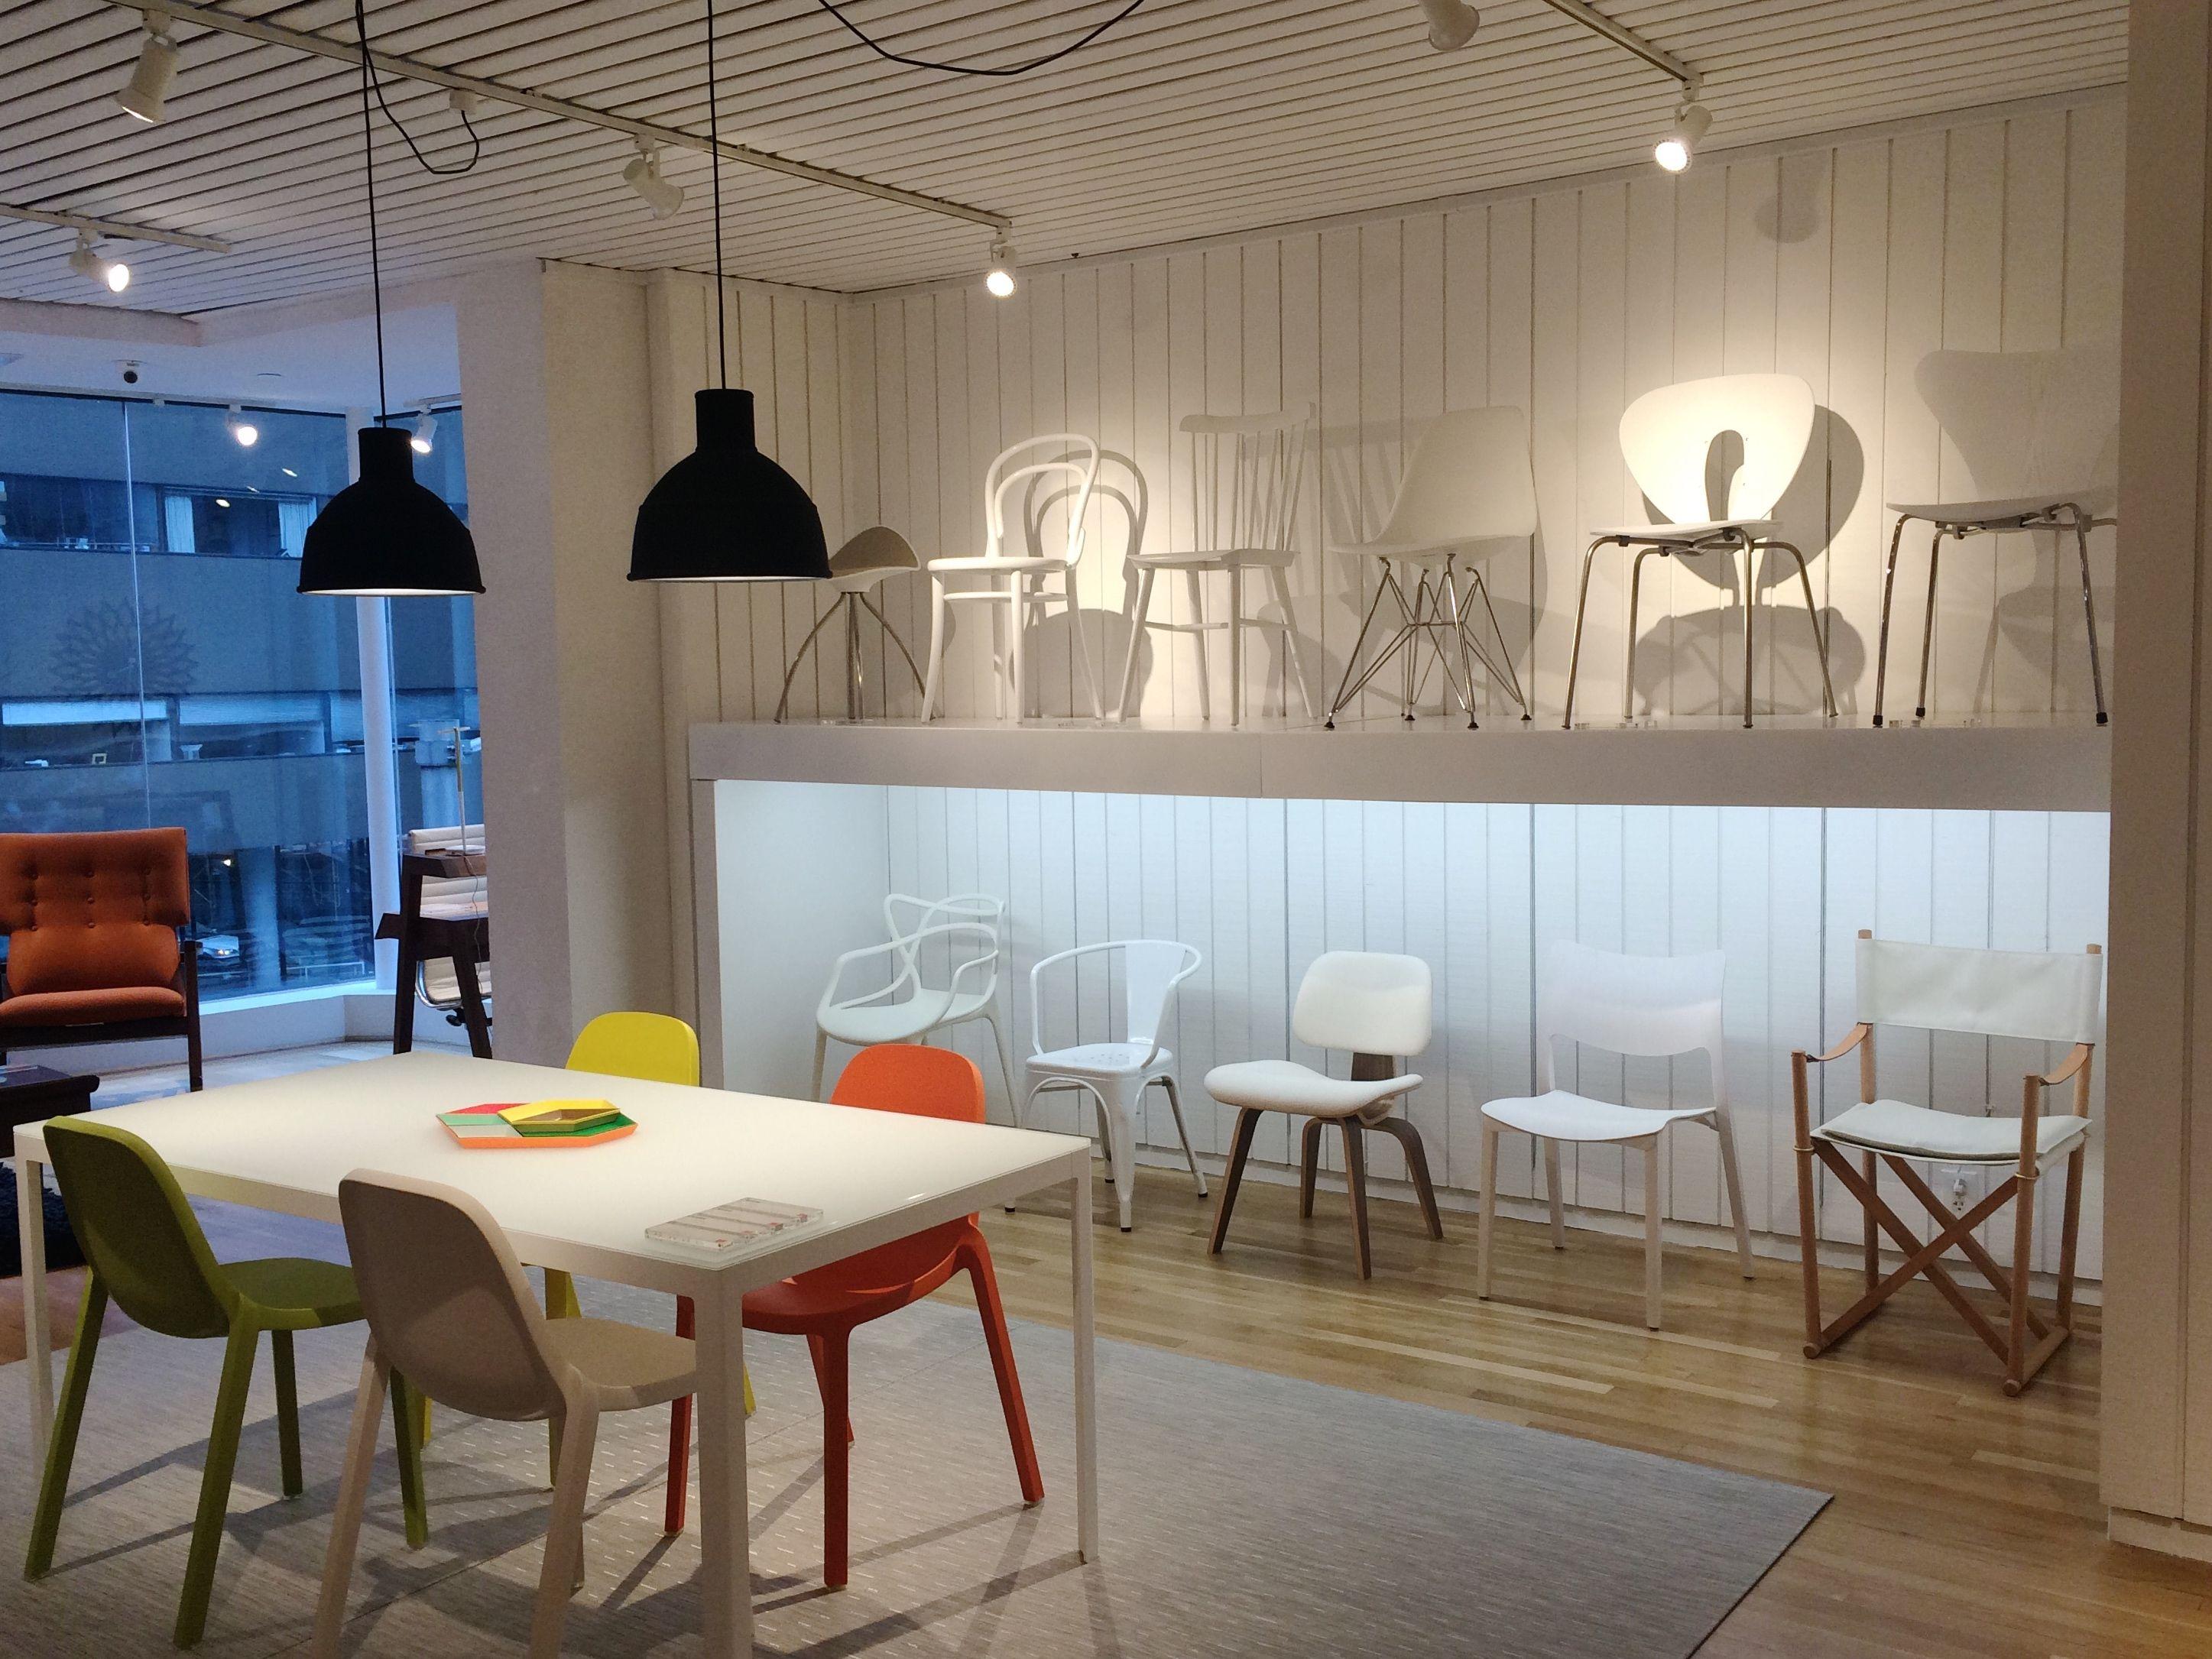 creative ways to display chairs